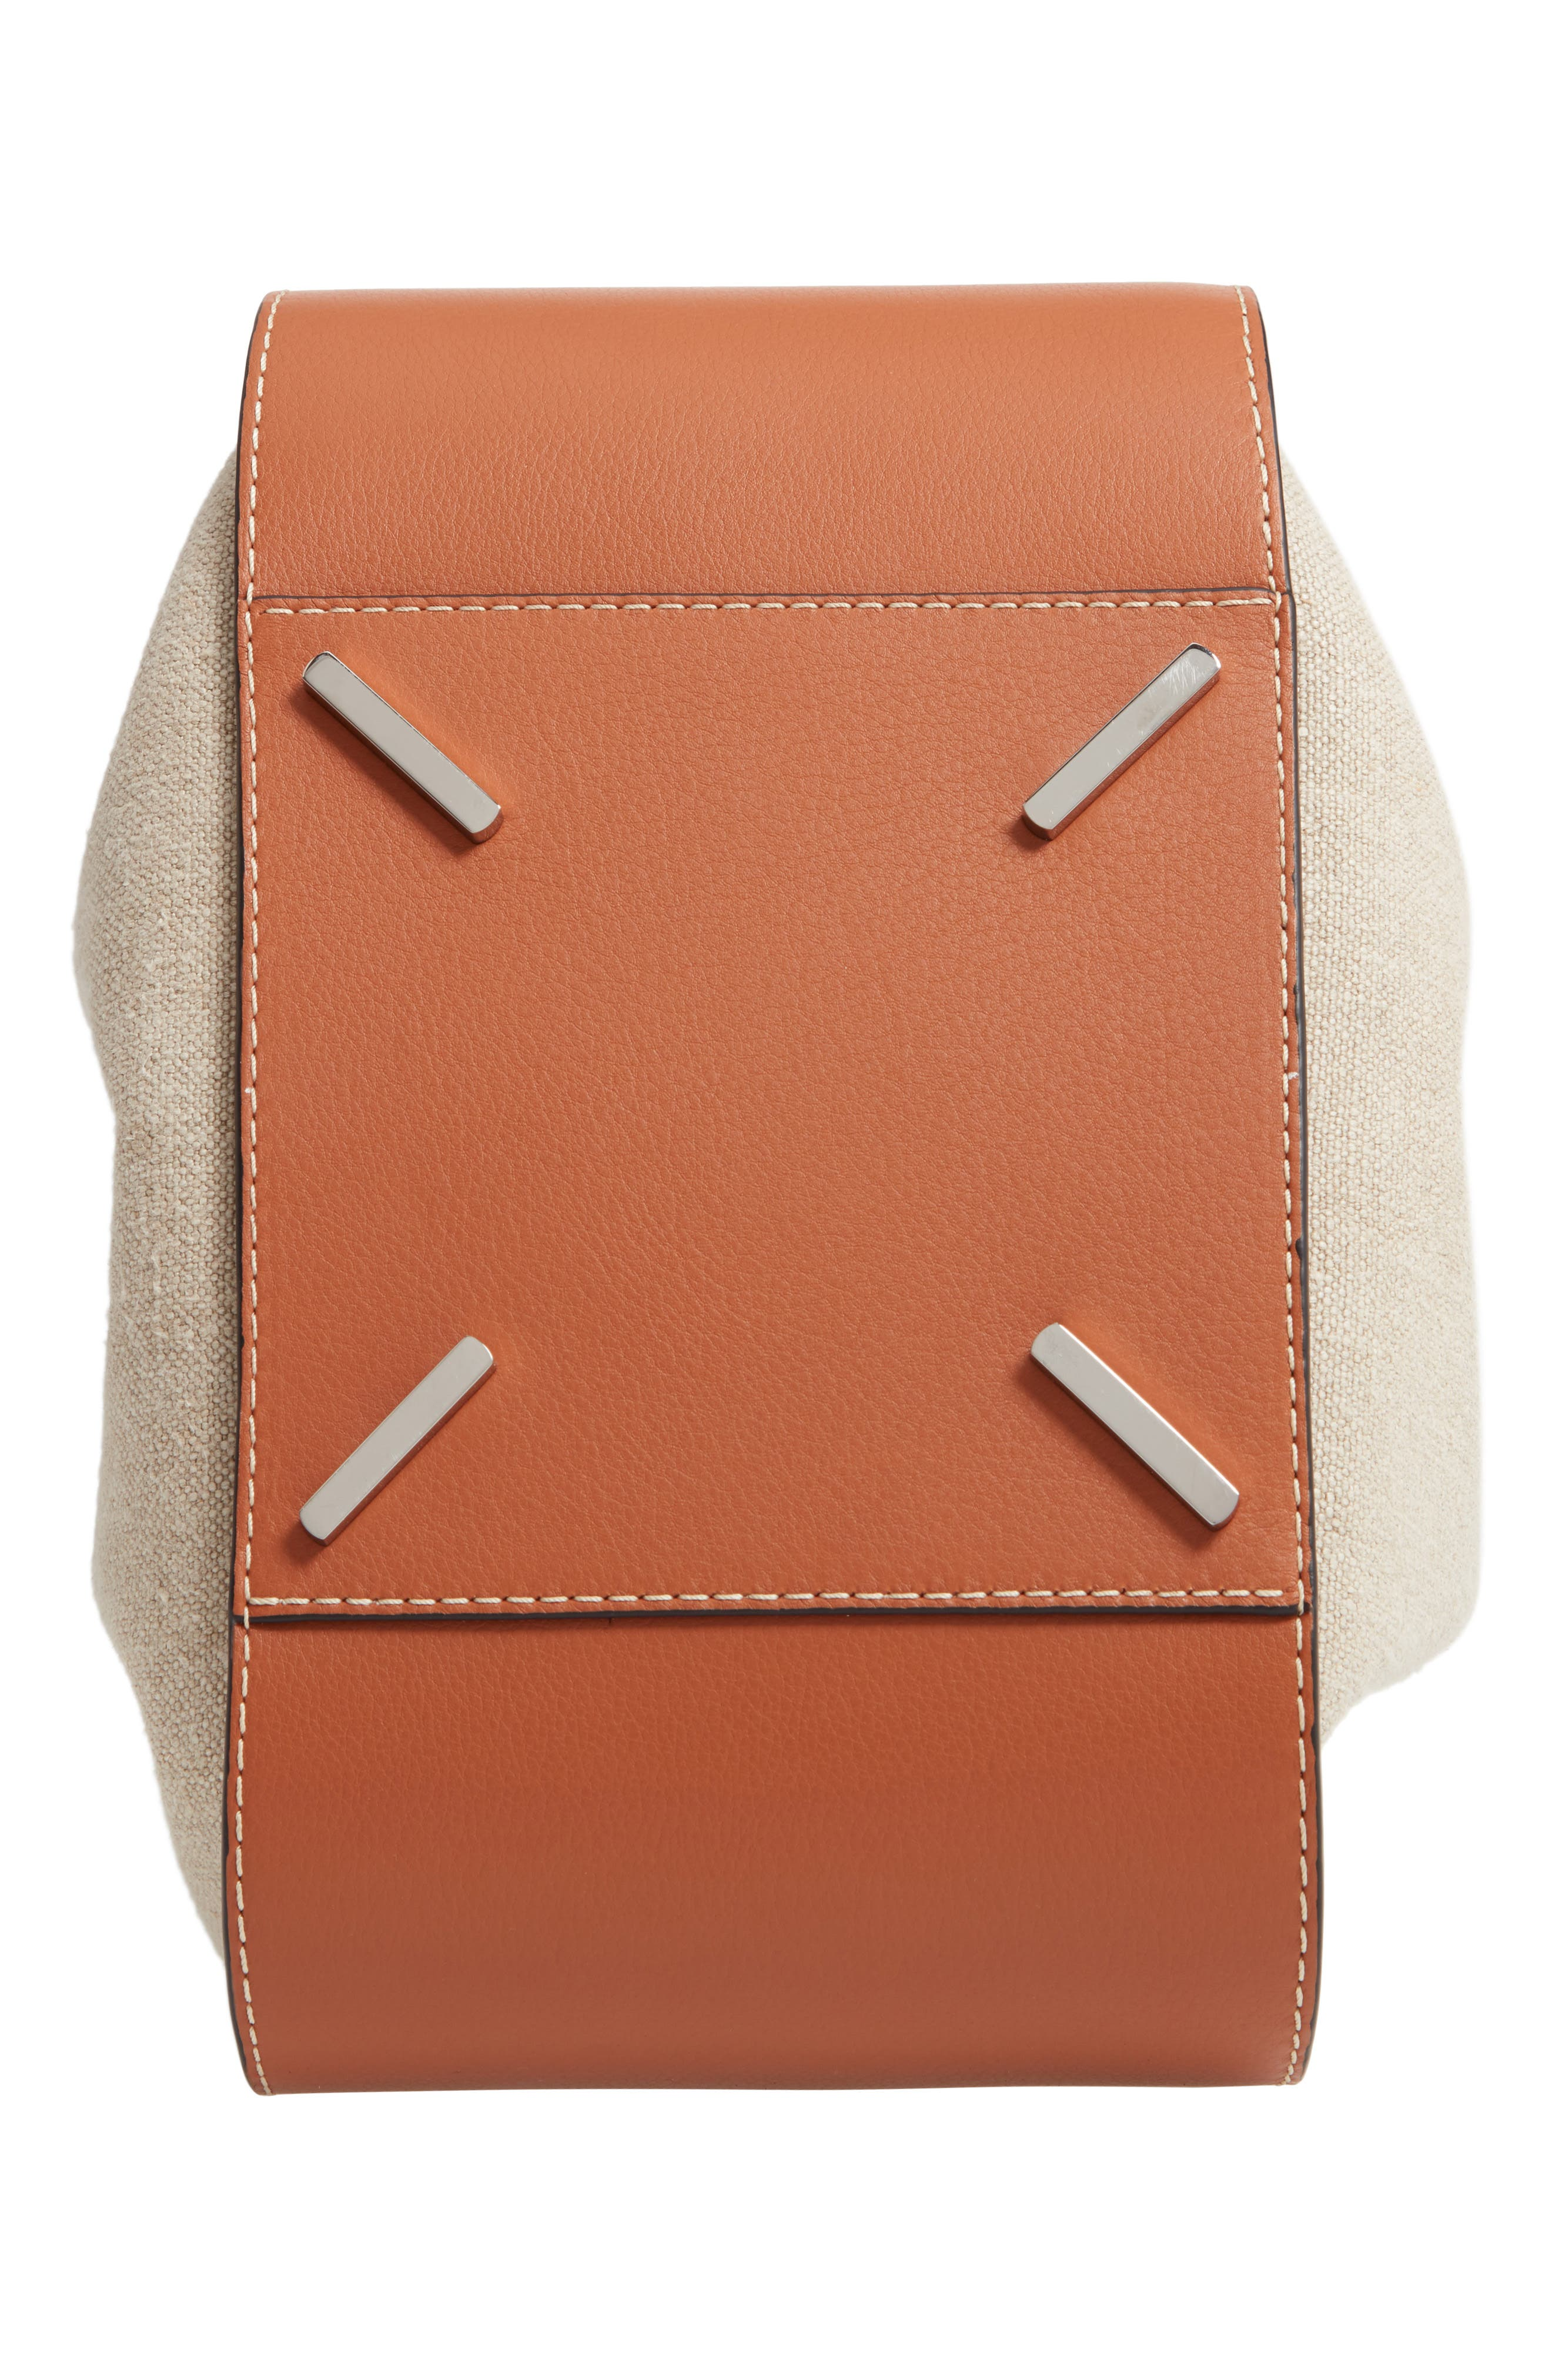 LOEWE,                             Hammock Drawstring Linen & Leather Hobo,                             Alternate thumbnail 7, color,                             TAN/ NATURAL